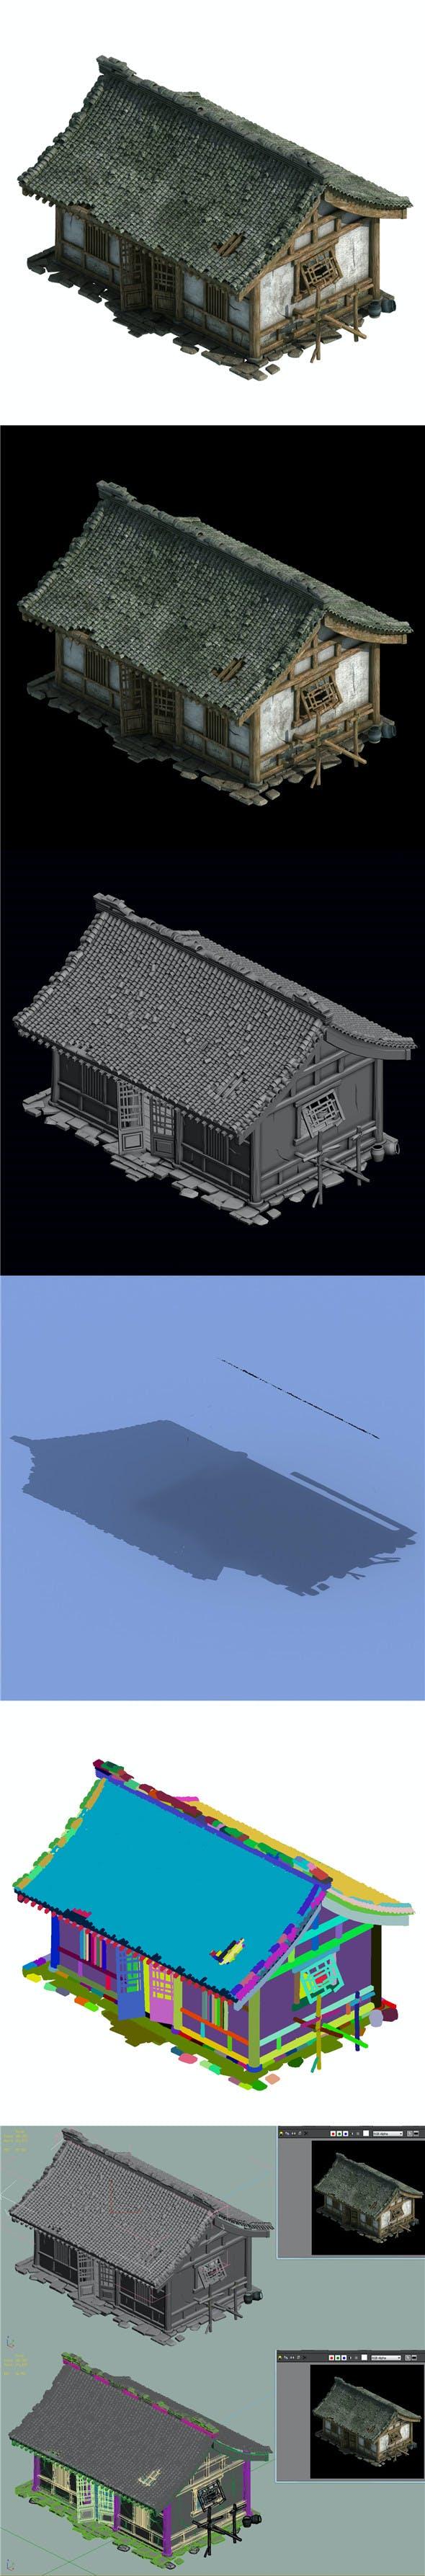 City Building - Broken House - 3DOcean Item for Sale